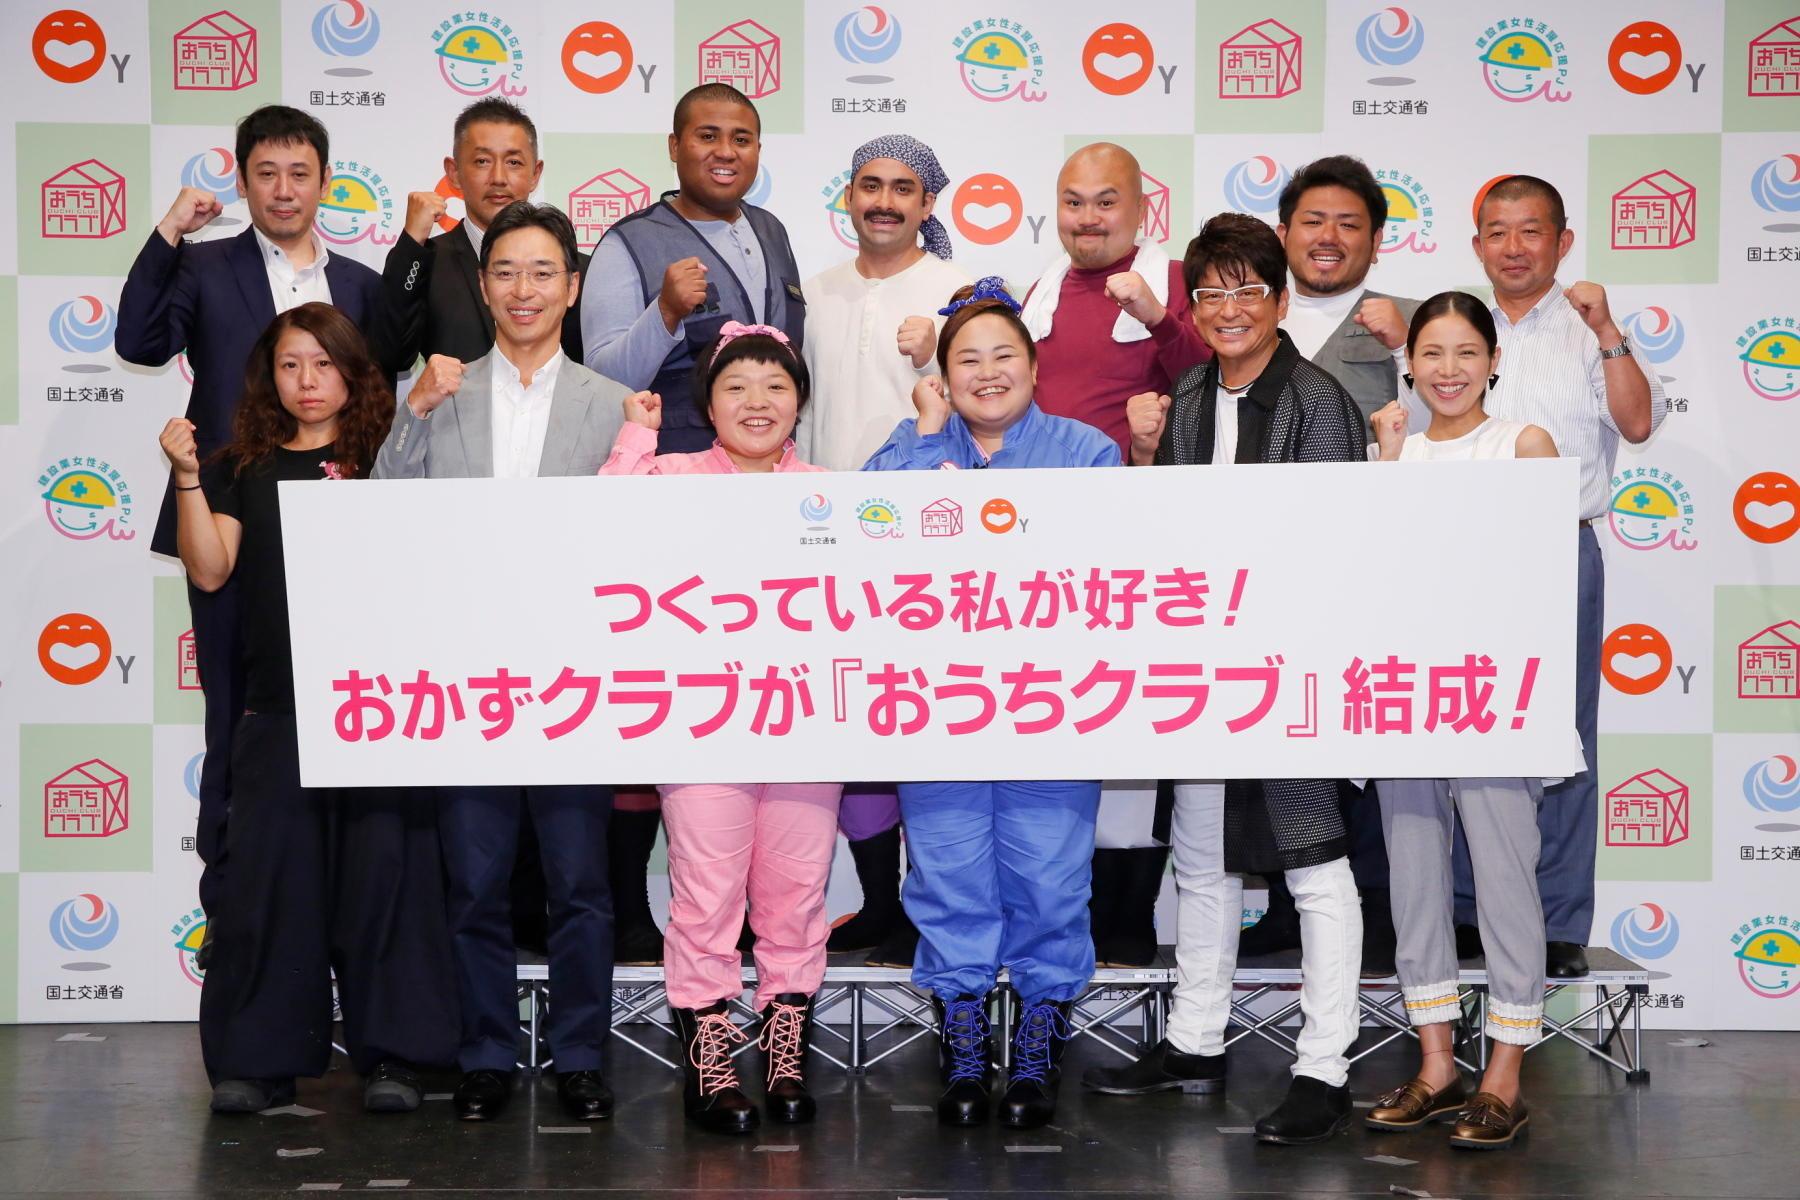 http://news.yoshimoto.co.jp/20160817181743-fd69509426b7ebaa1d13301511d83dda684f20bf.jpg